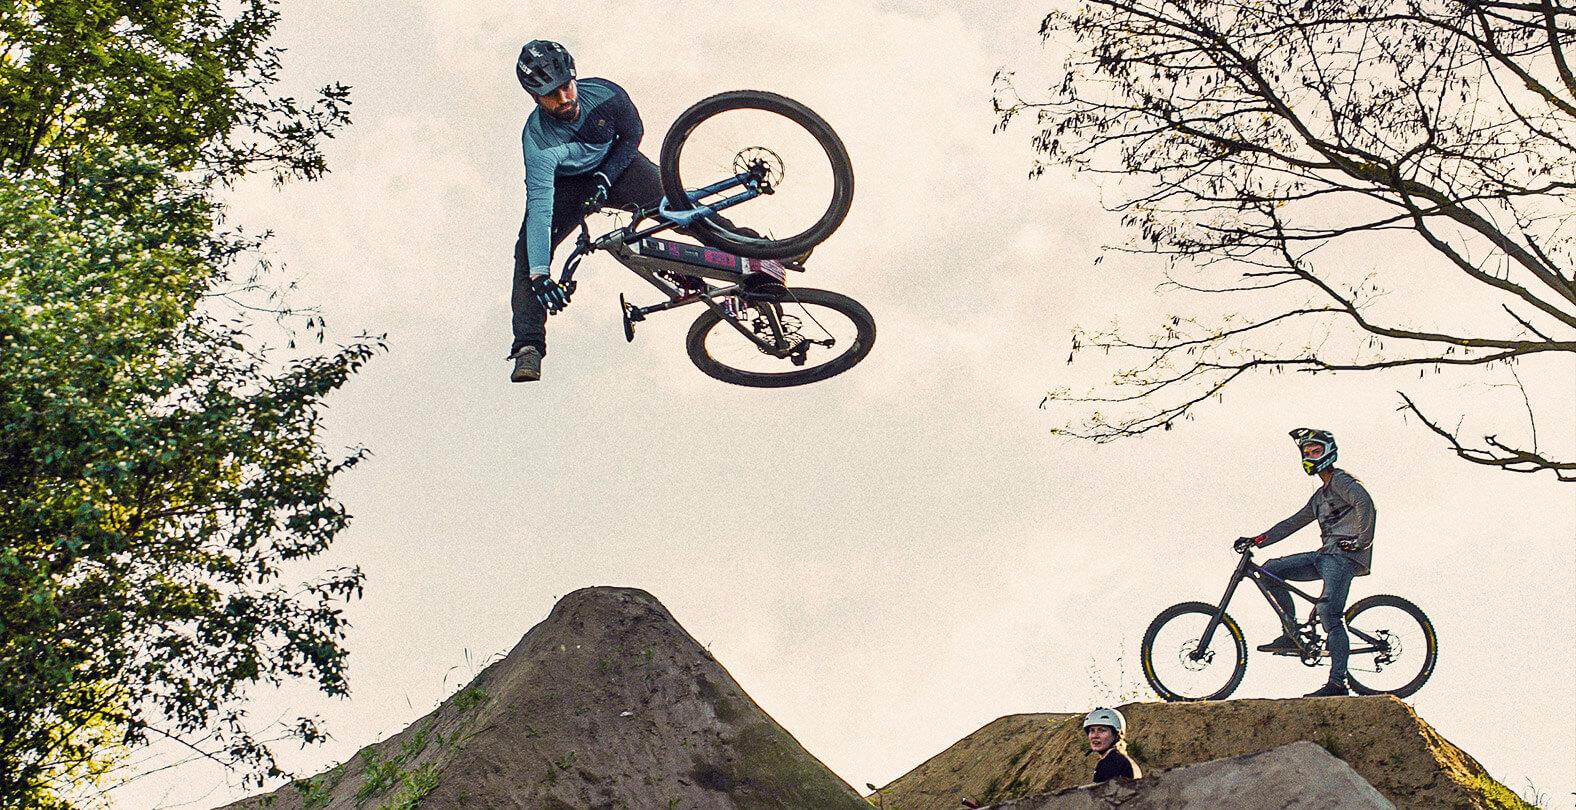 Dirt Biker Timo Pritzel jumping over kickers.